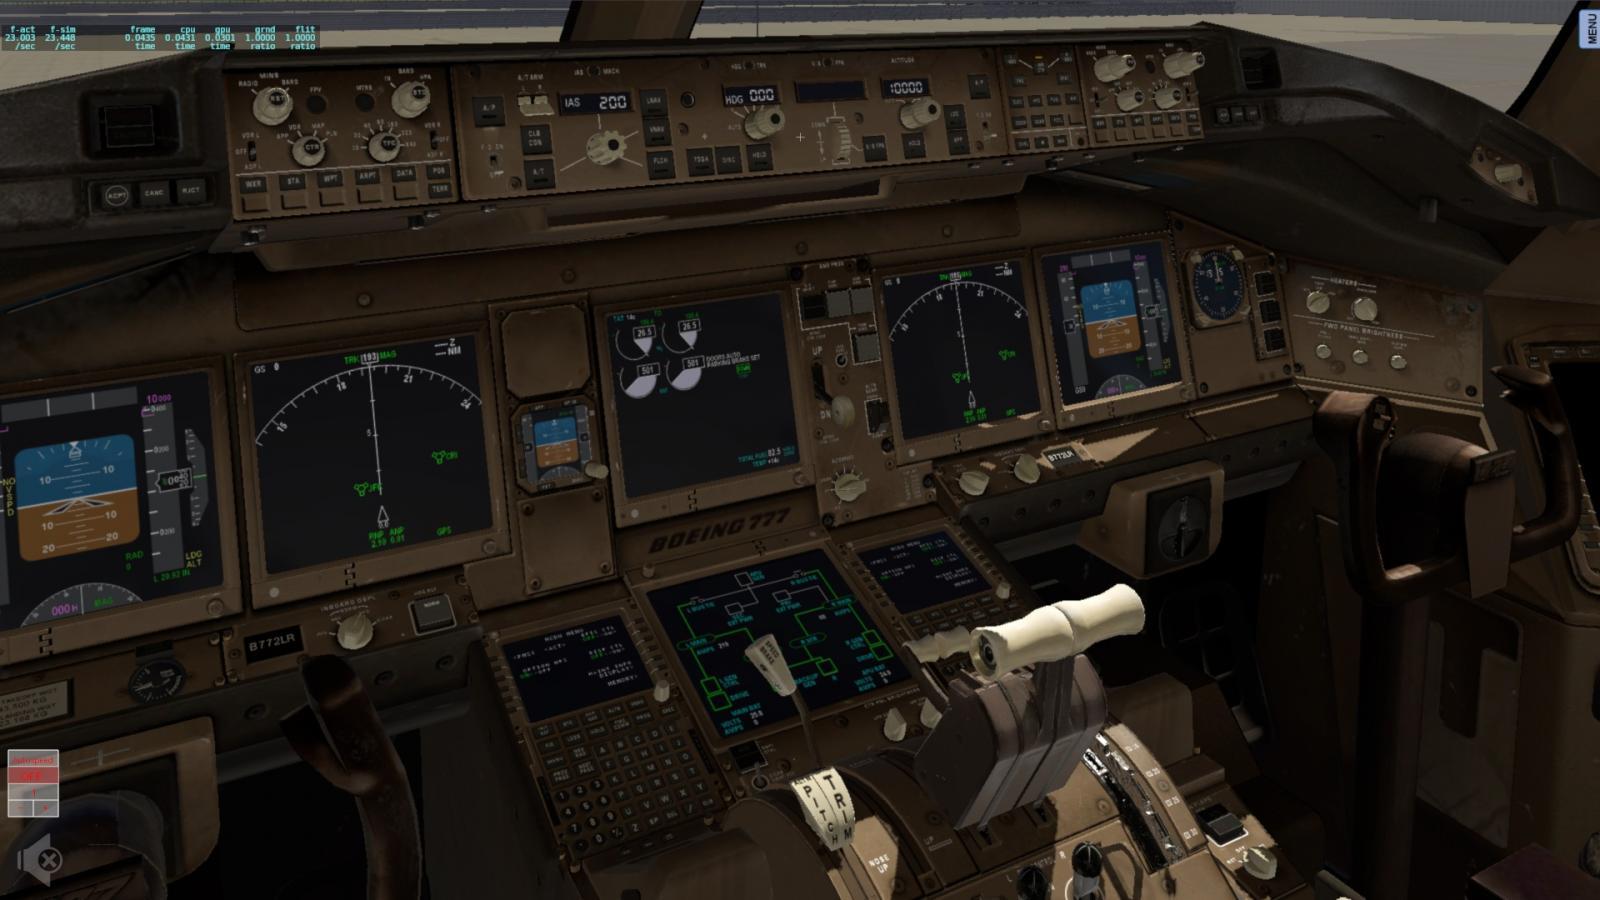 Flight factor 777 - XP11: Is it a bug ? - X-Plane Org Forum